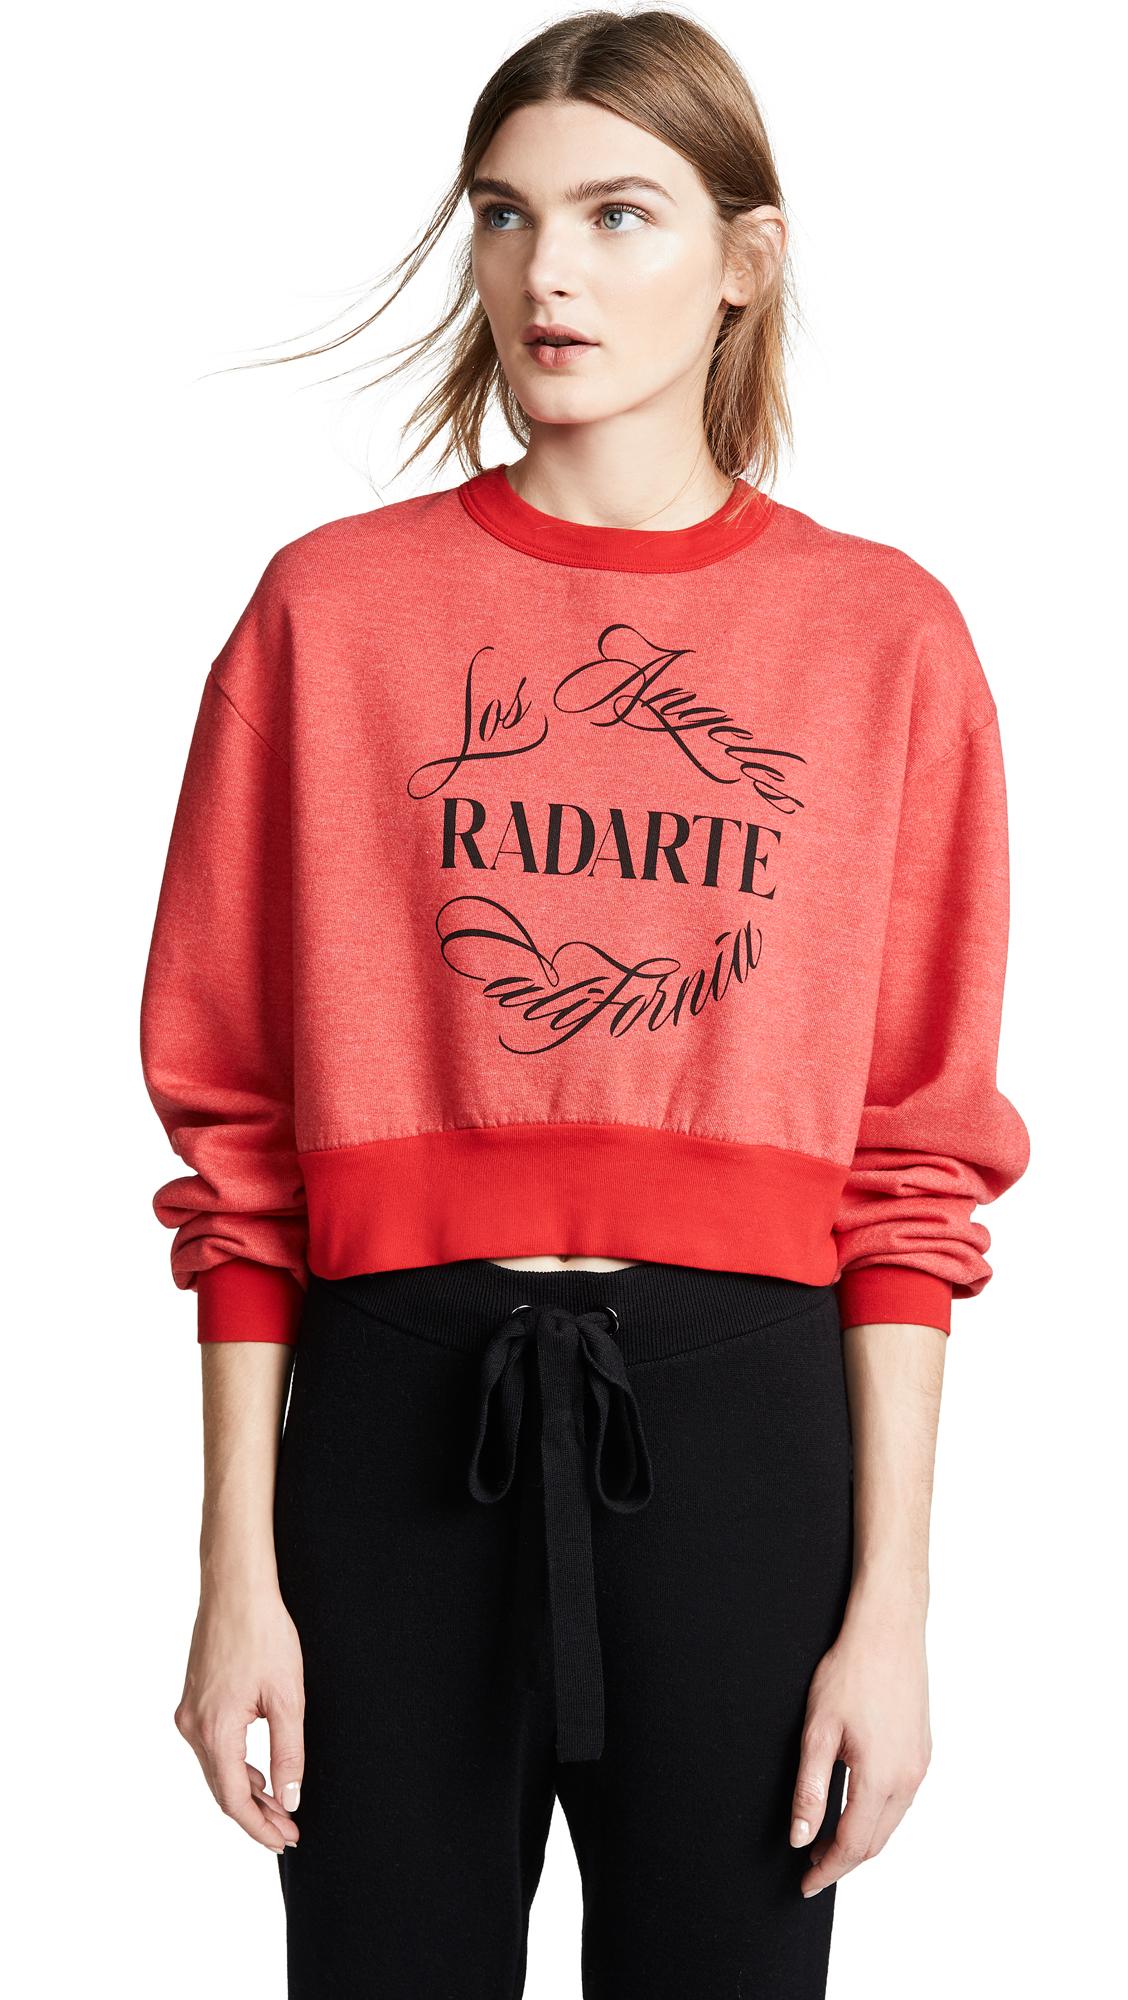 RODARTE Radarte Emblem Sweatshirt in Red/Black